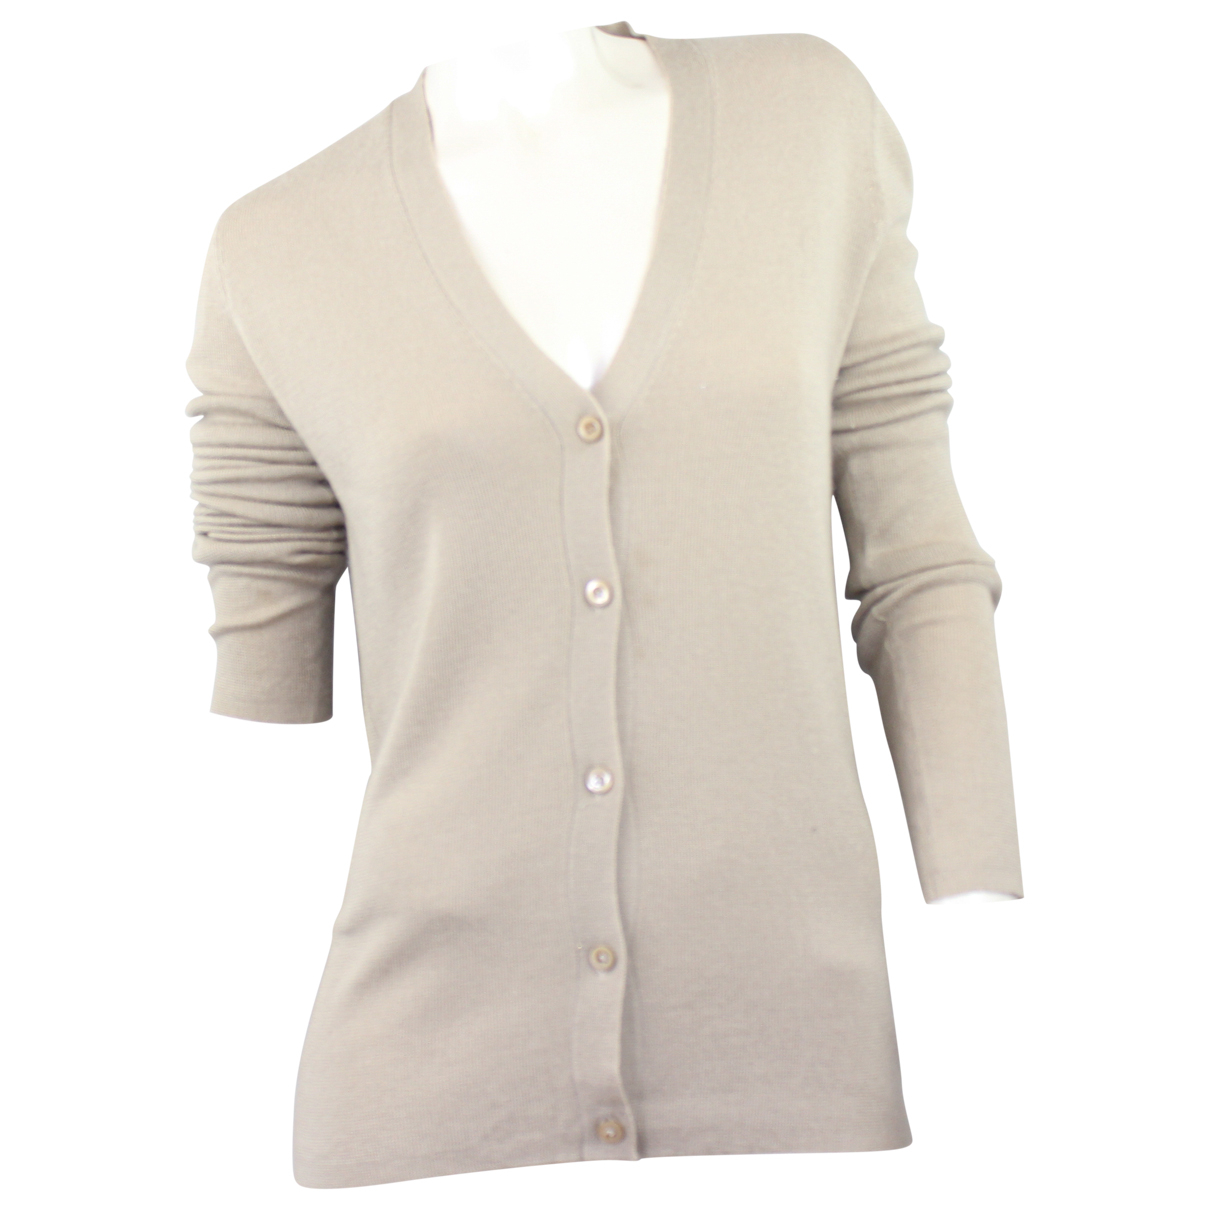 Prada - Pull   pour femme en cachemire - beige